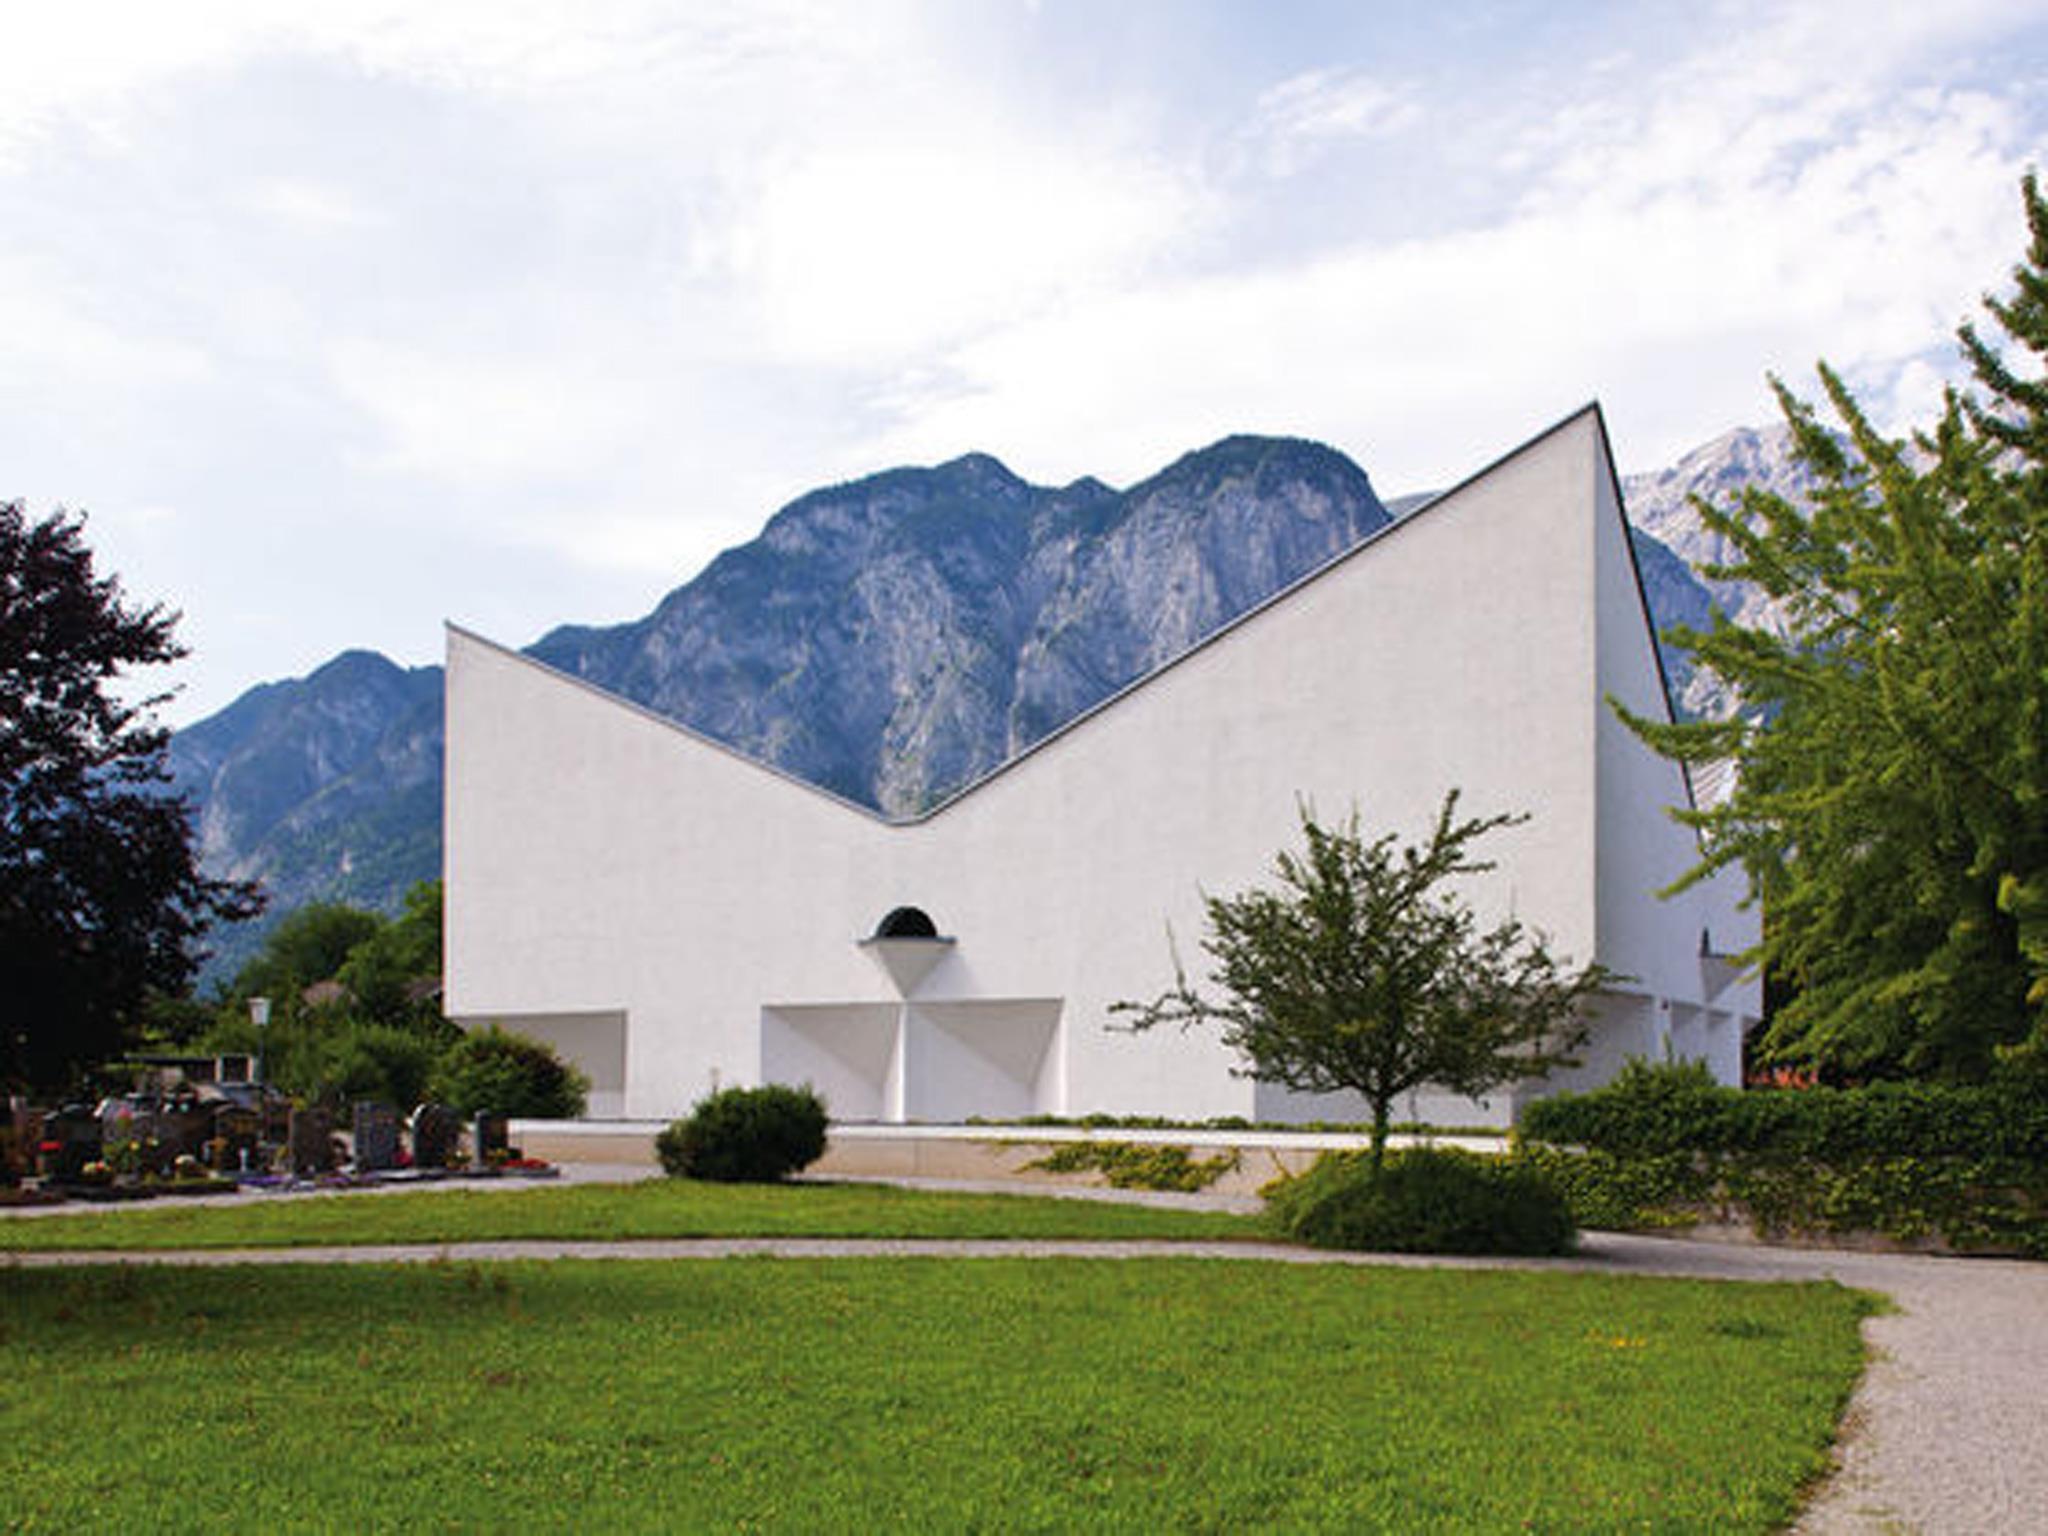 R.k. Pfarrkirche Völs